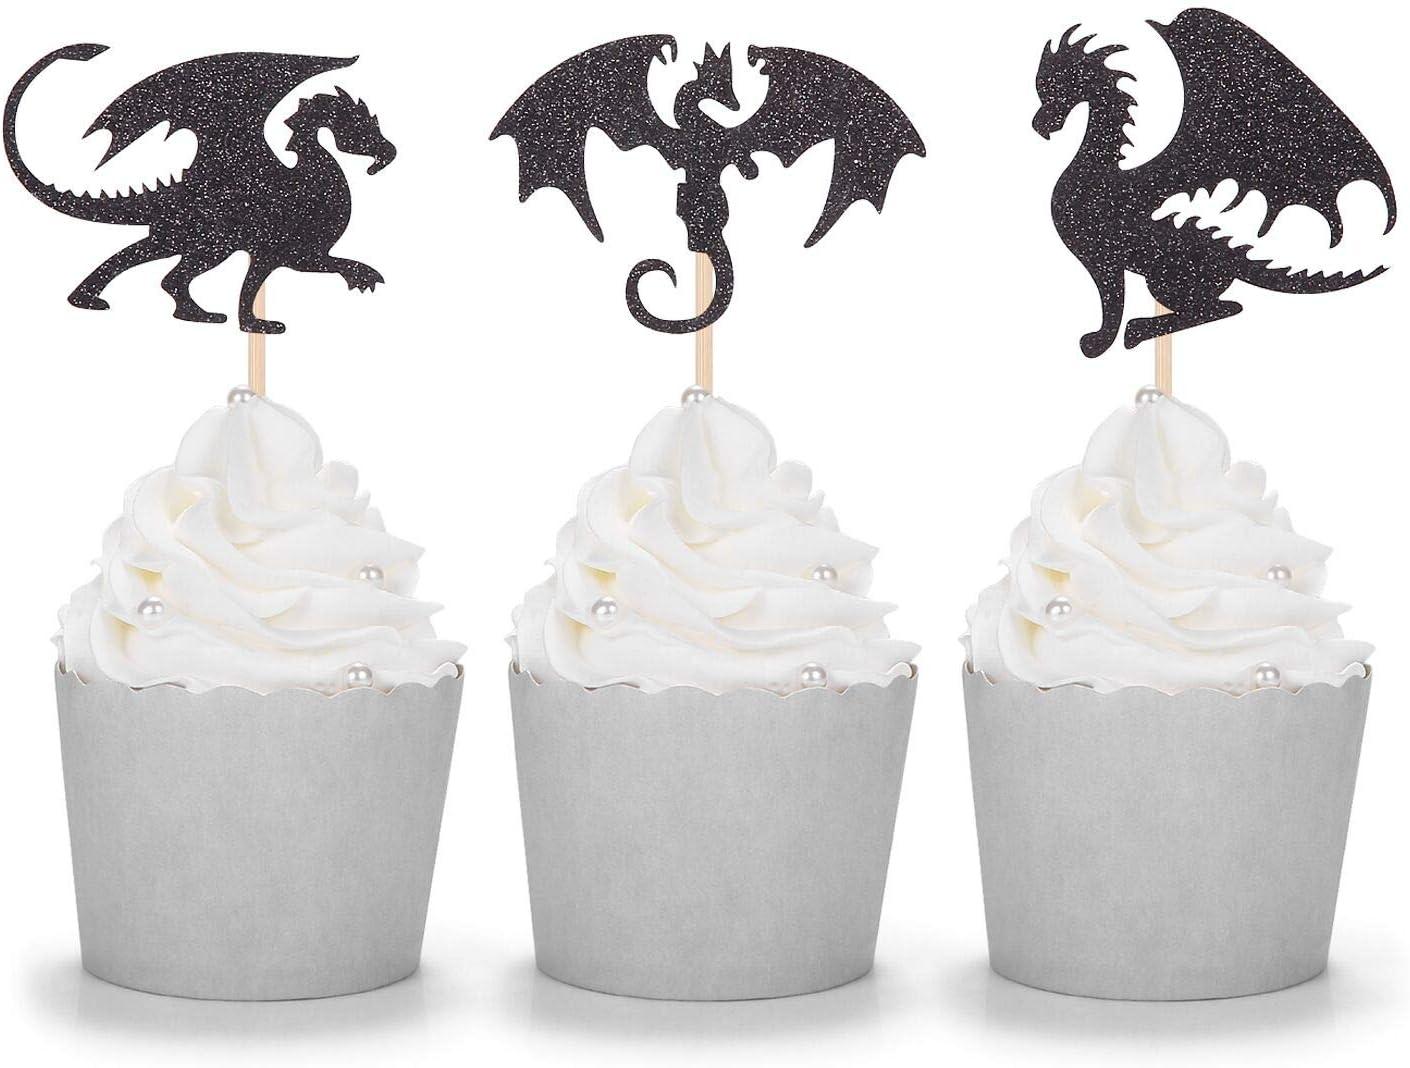 24 CT Black Glitter Dragon Cupcake Toppers Fantasy Party Dessert Picks Fairy Tale Decoration